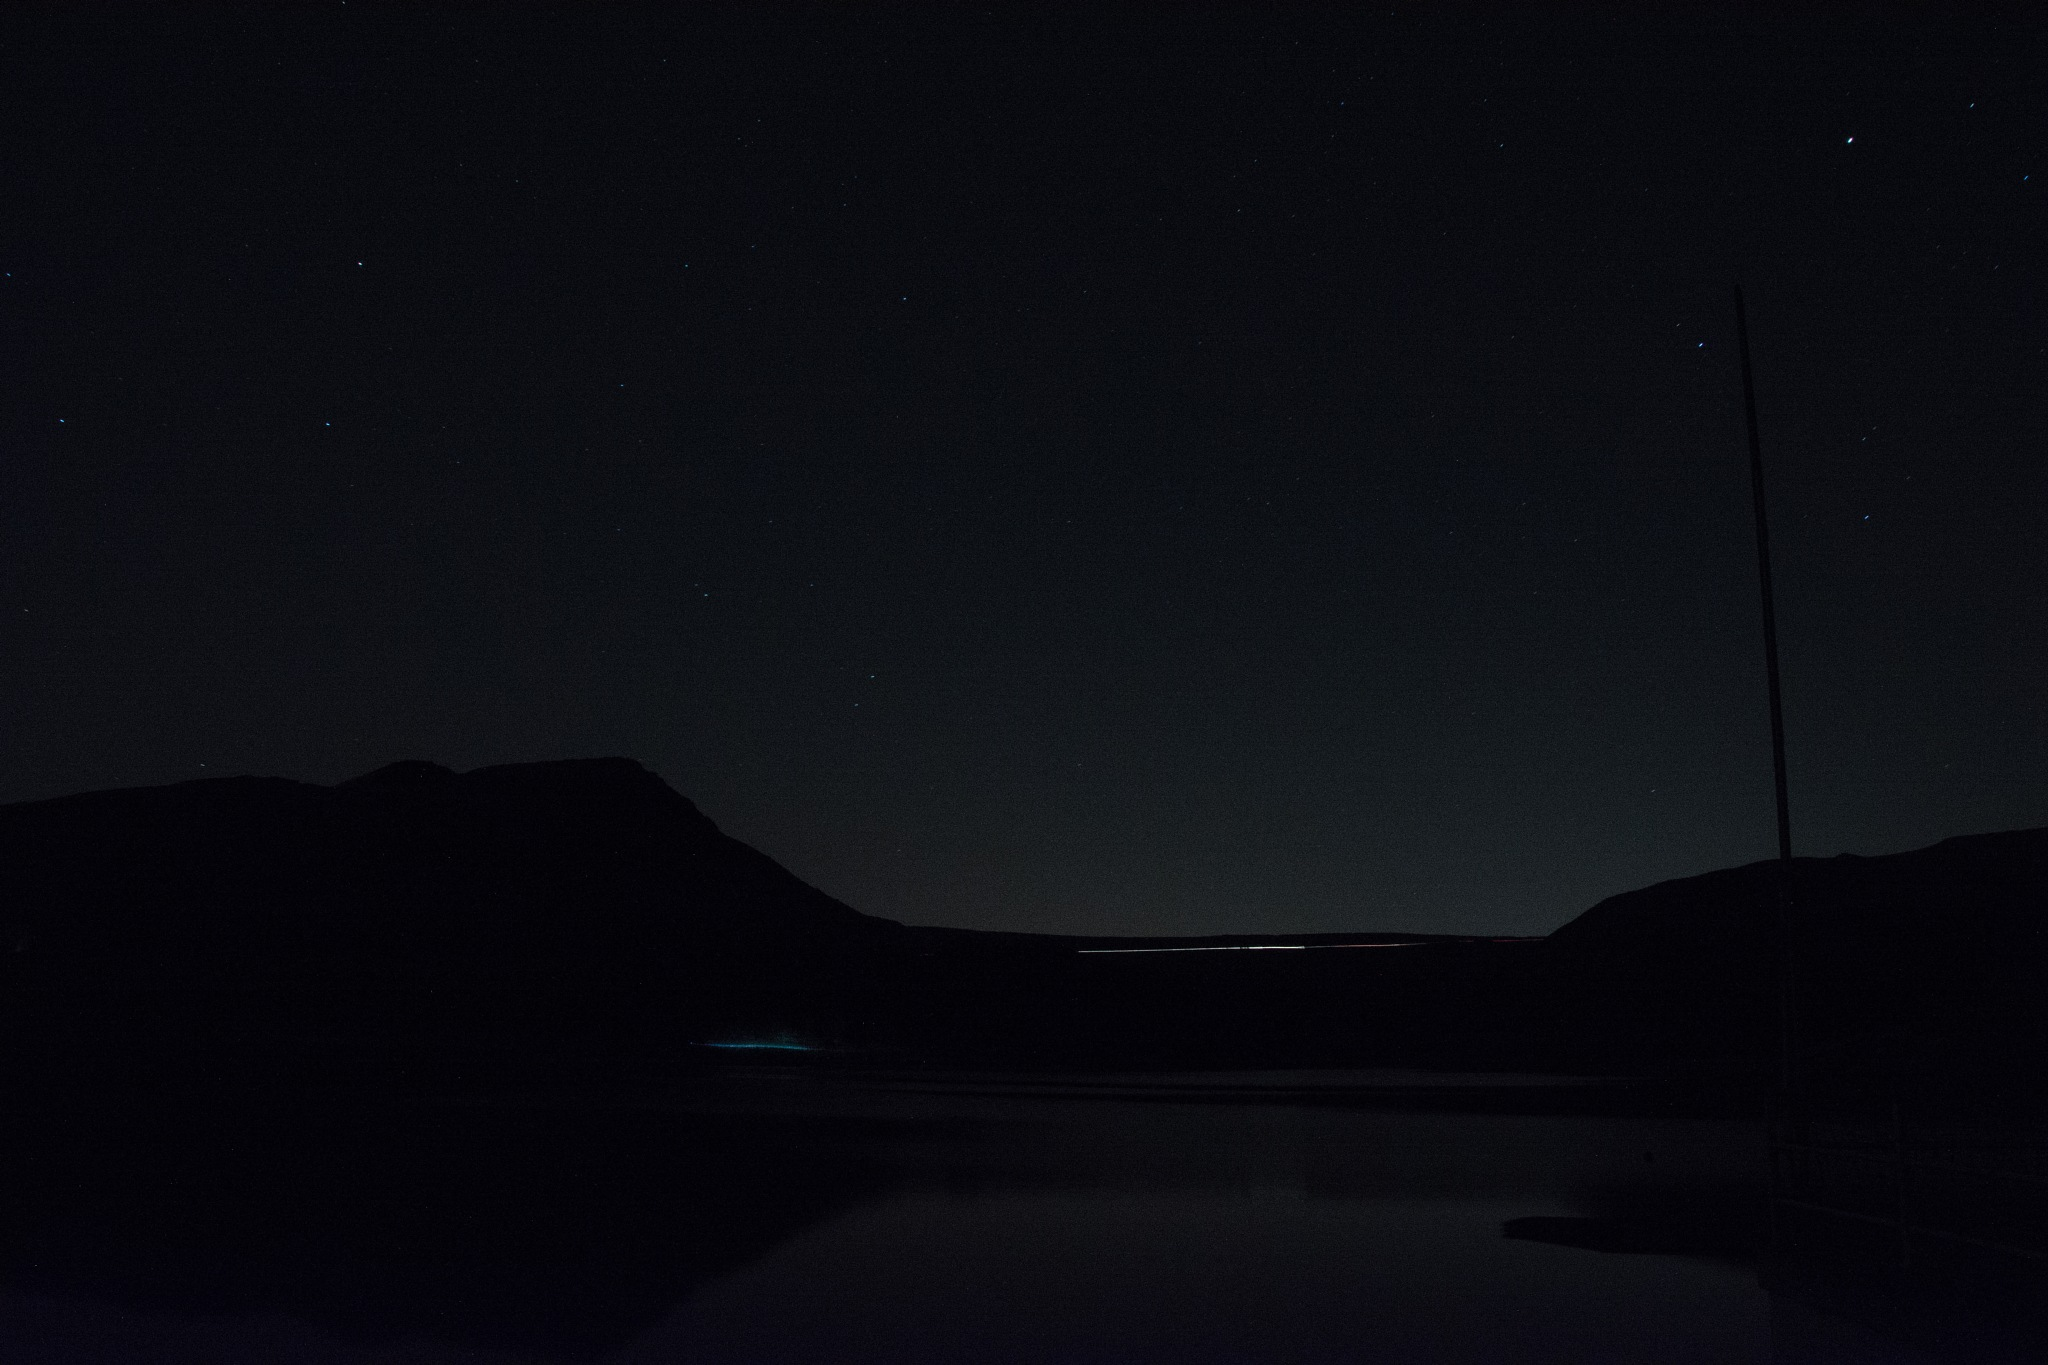 Night over Dovestones by ianjck